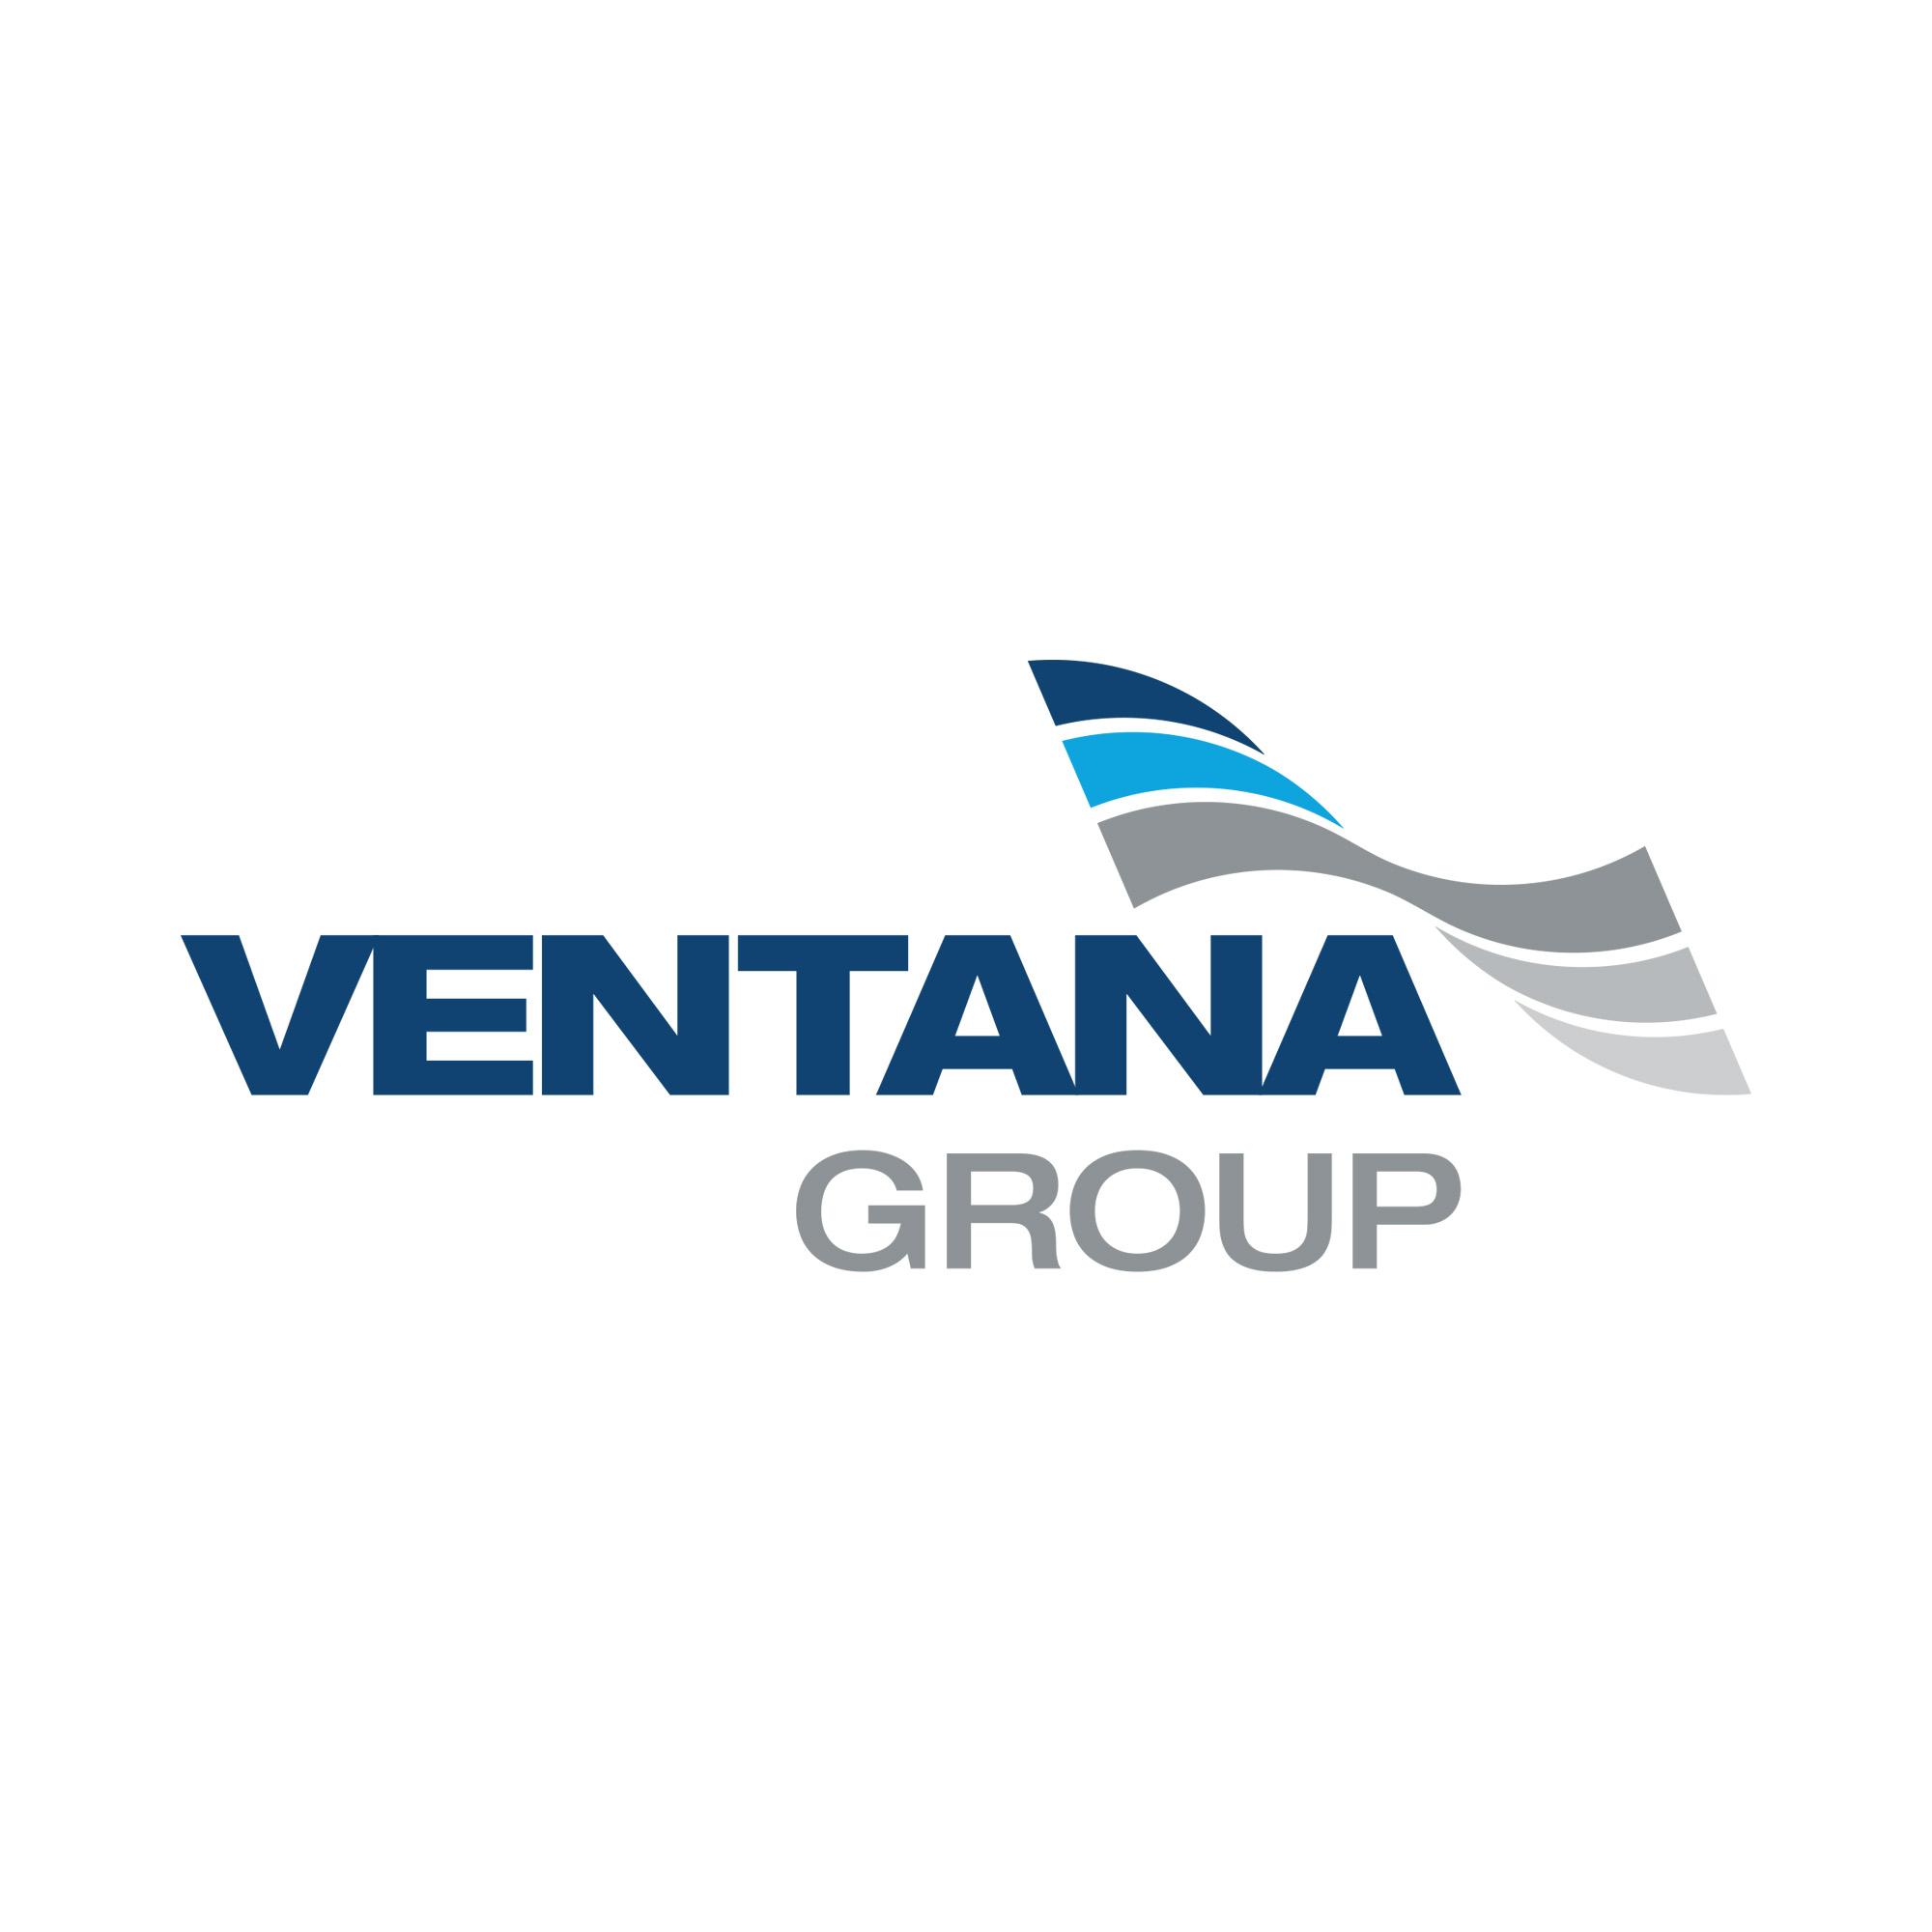 ventana group Supply Chain Managemen